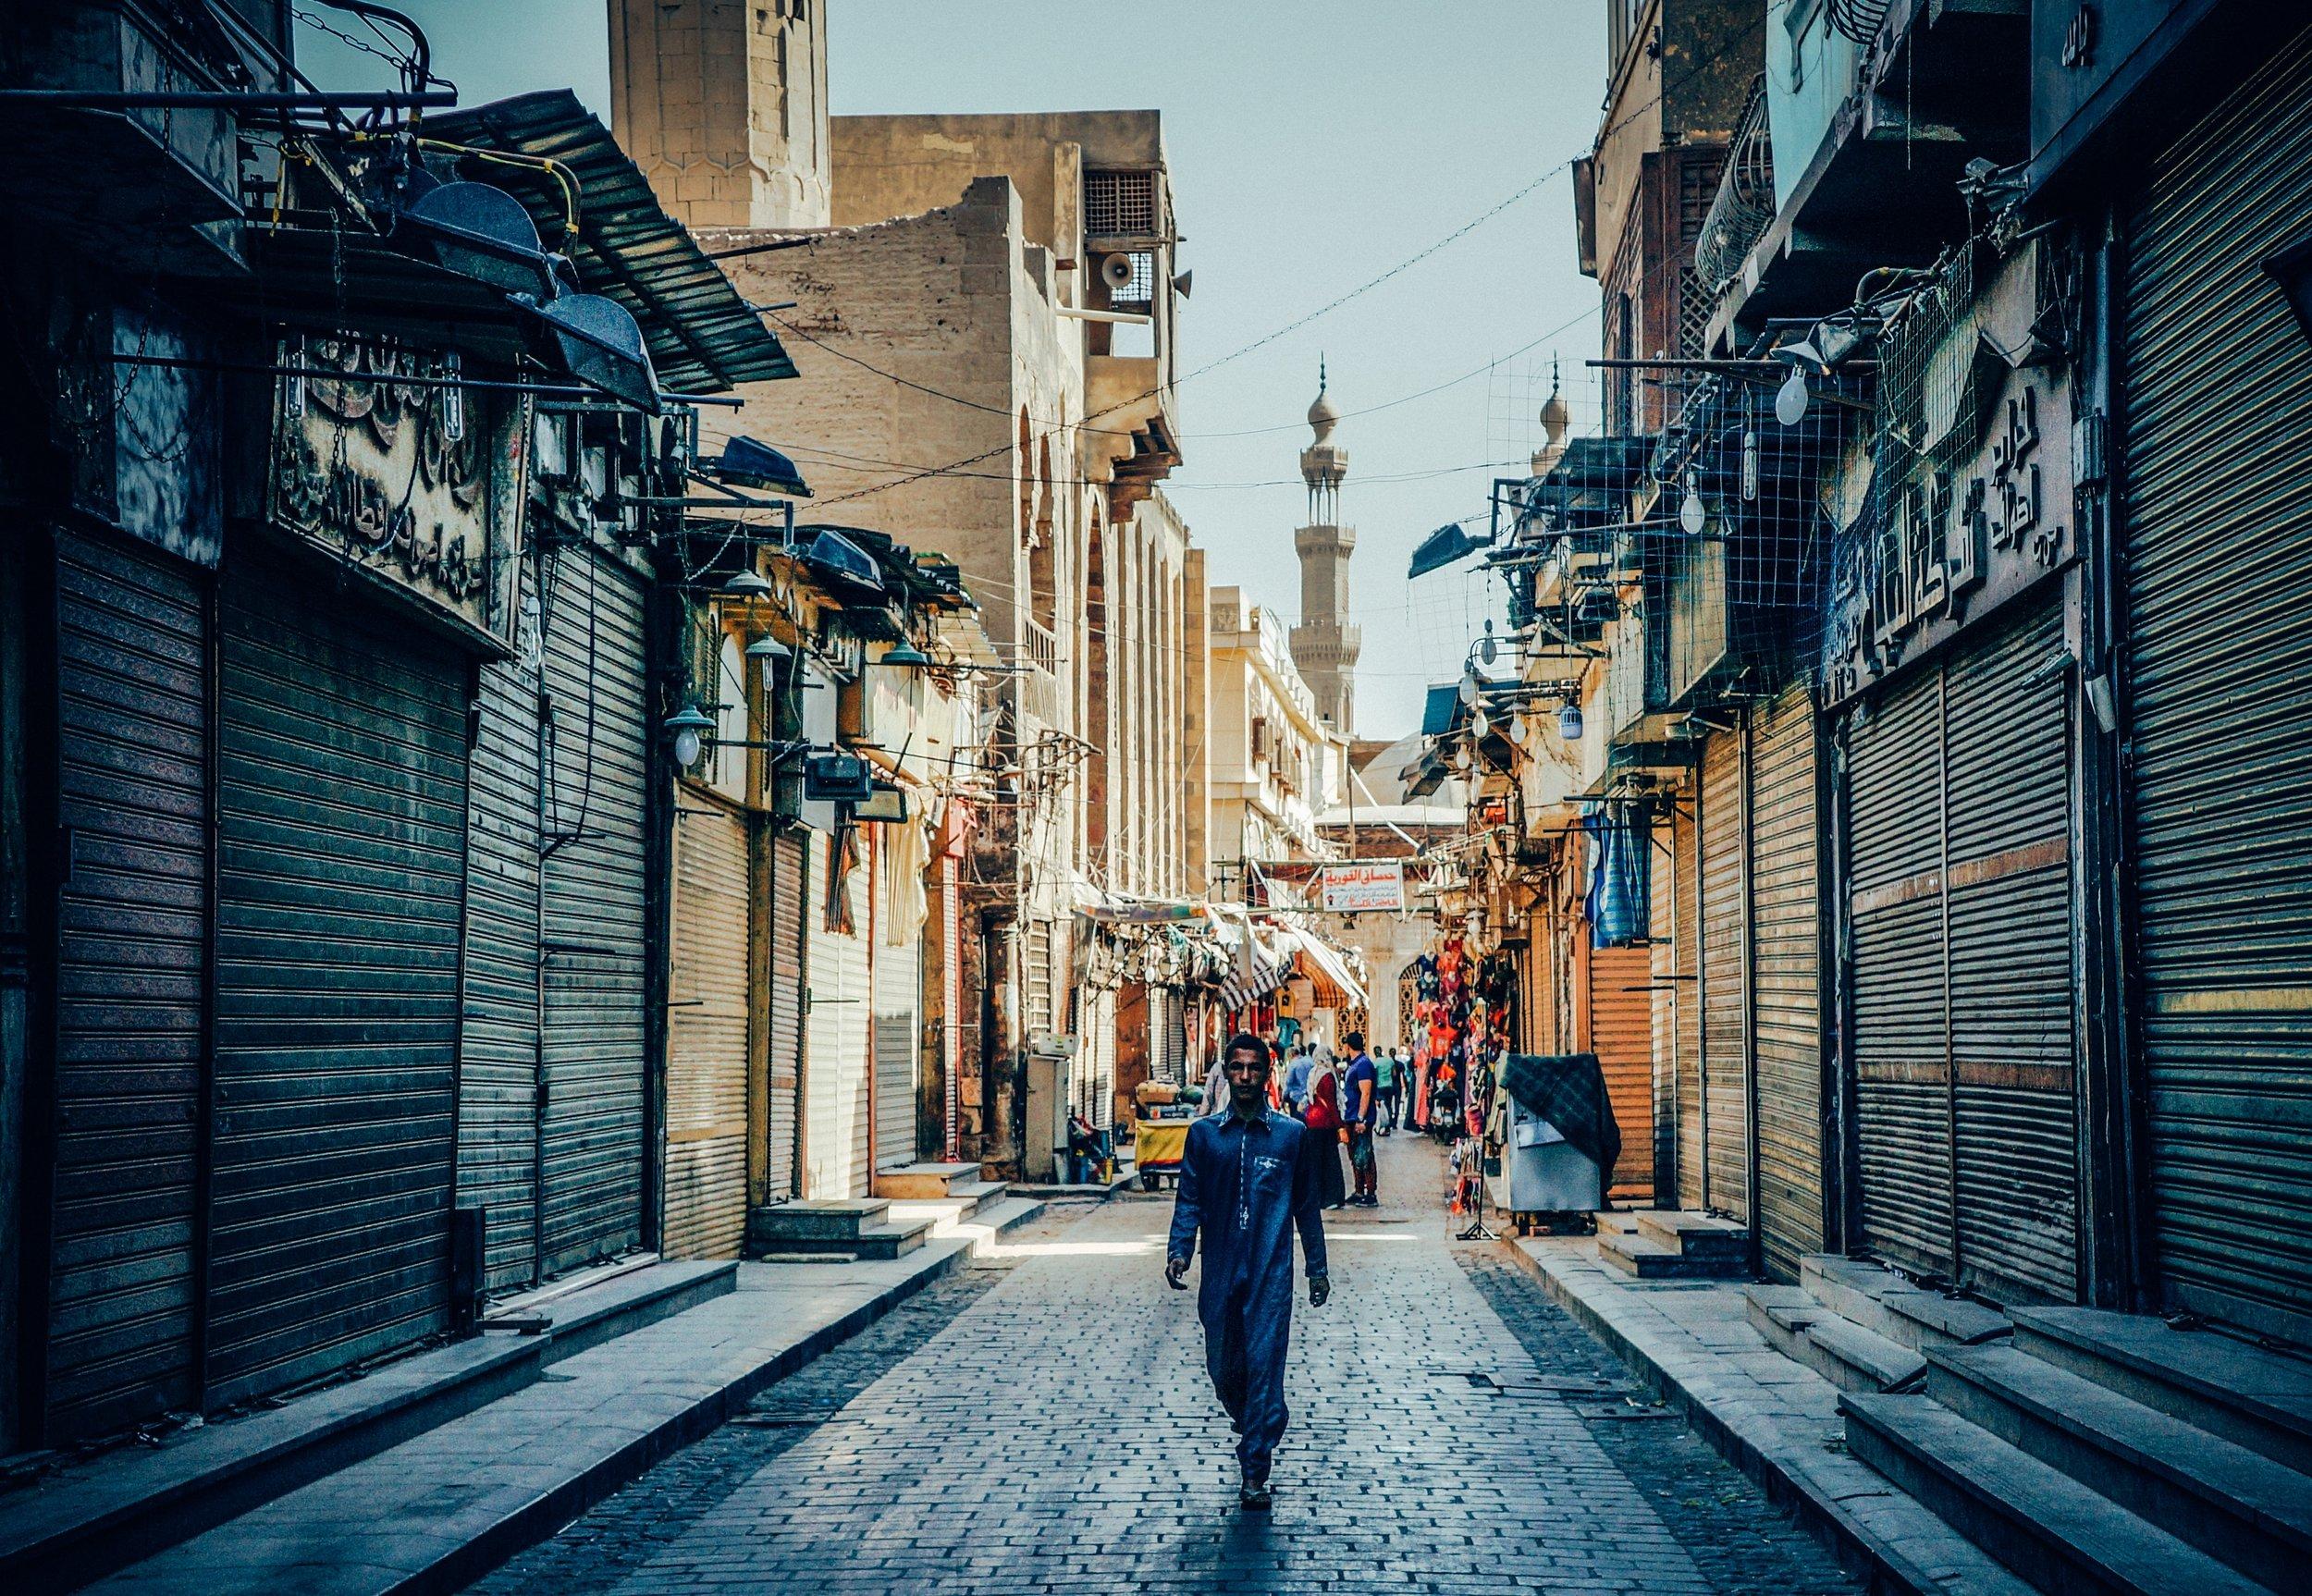 mii-working-in-cairo.jpg